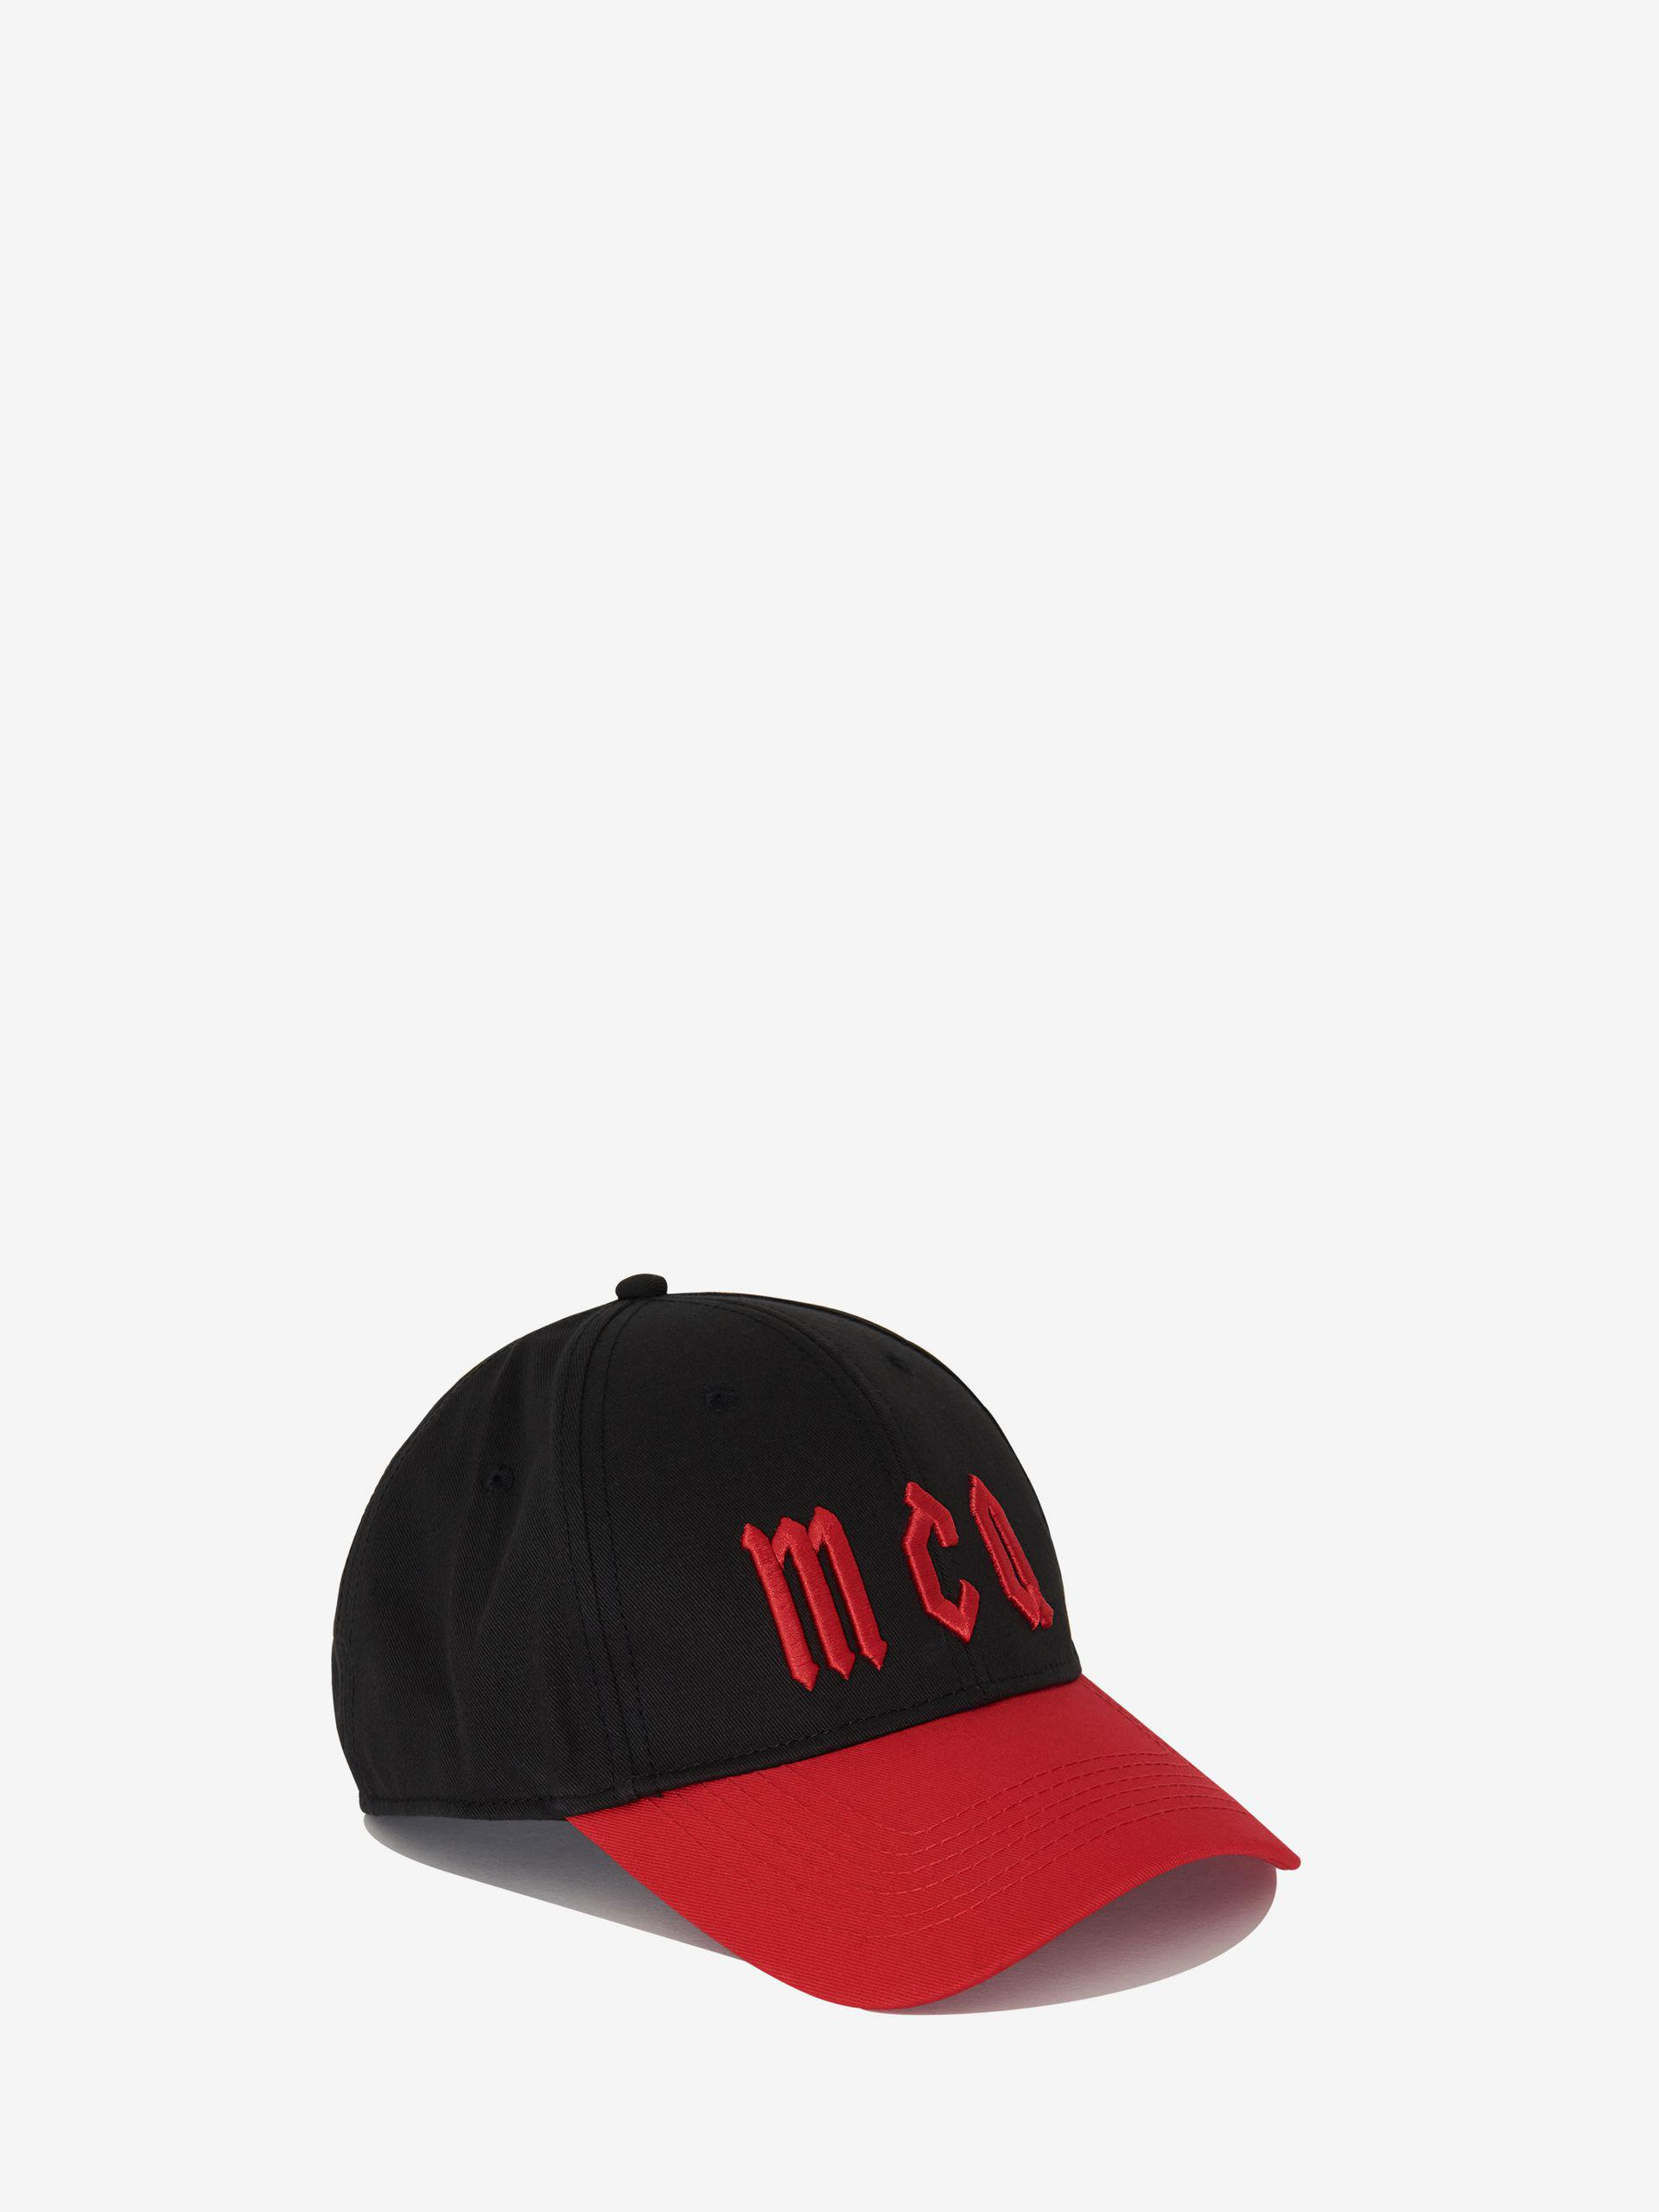 Mcq Alexander Mcqueen Mcq Gothic Logo Baseball Cap in Black for Men ... 7d9284b0329d